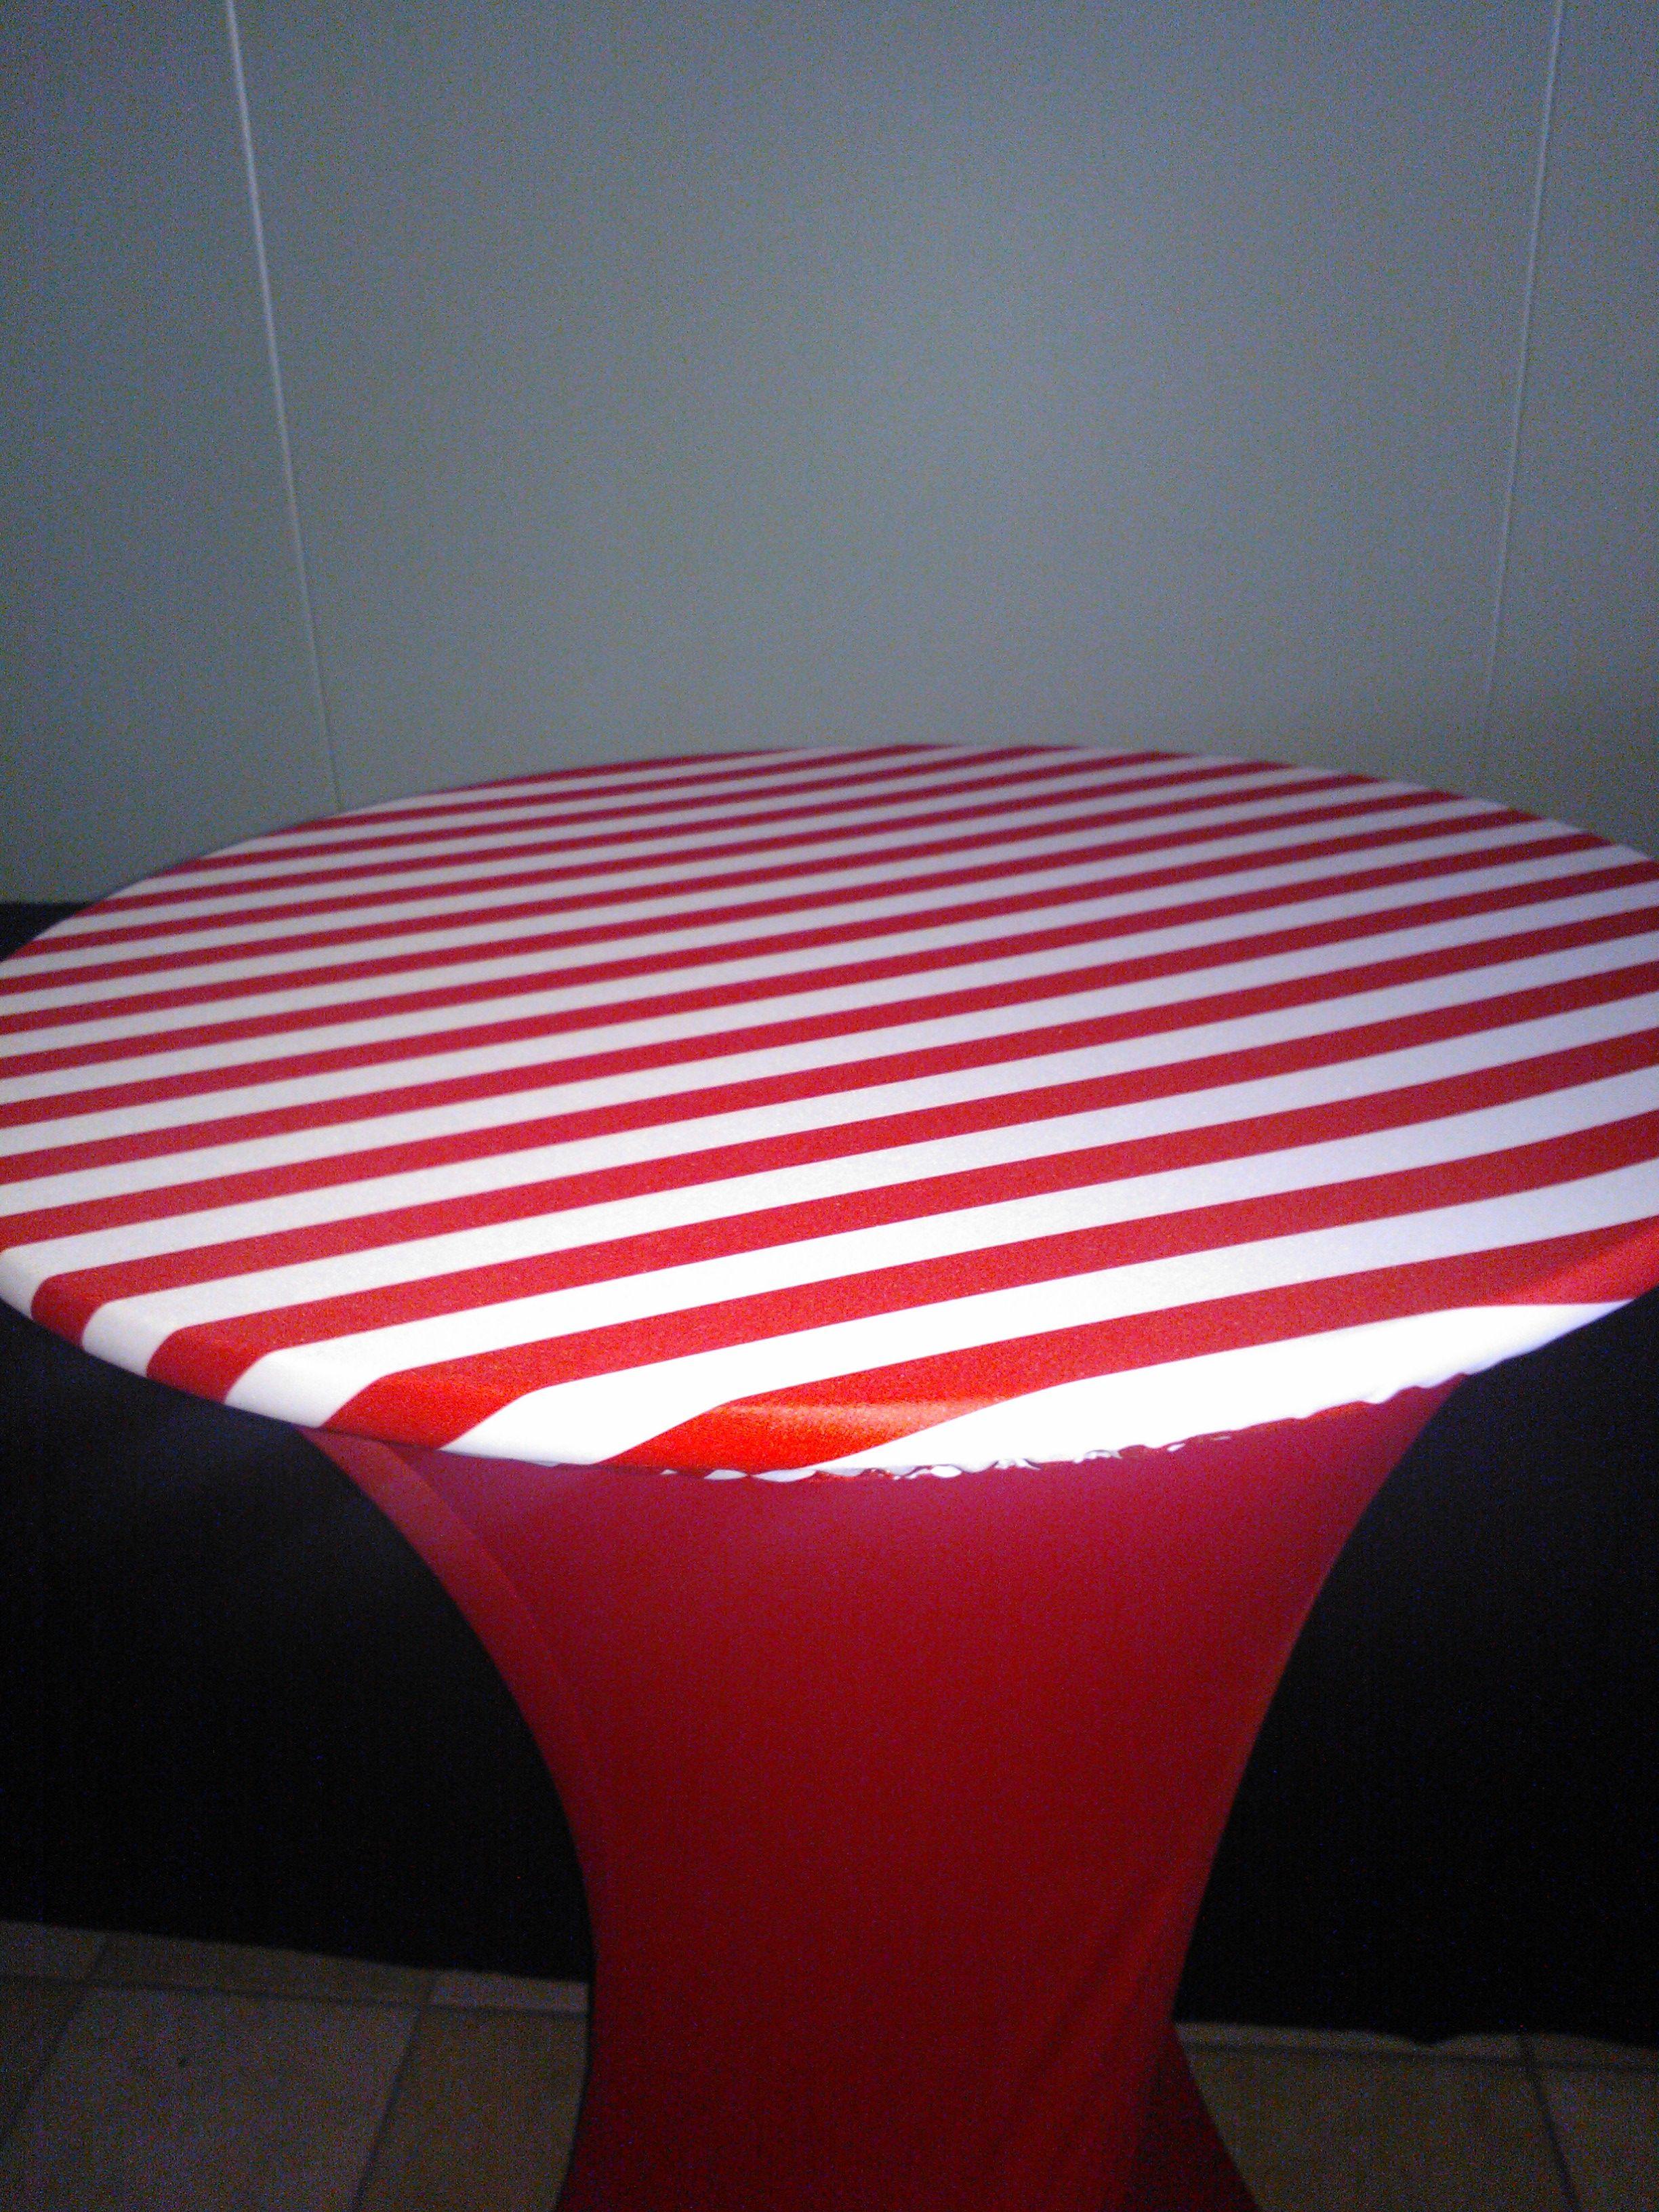 Red/White Stripes!